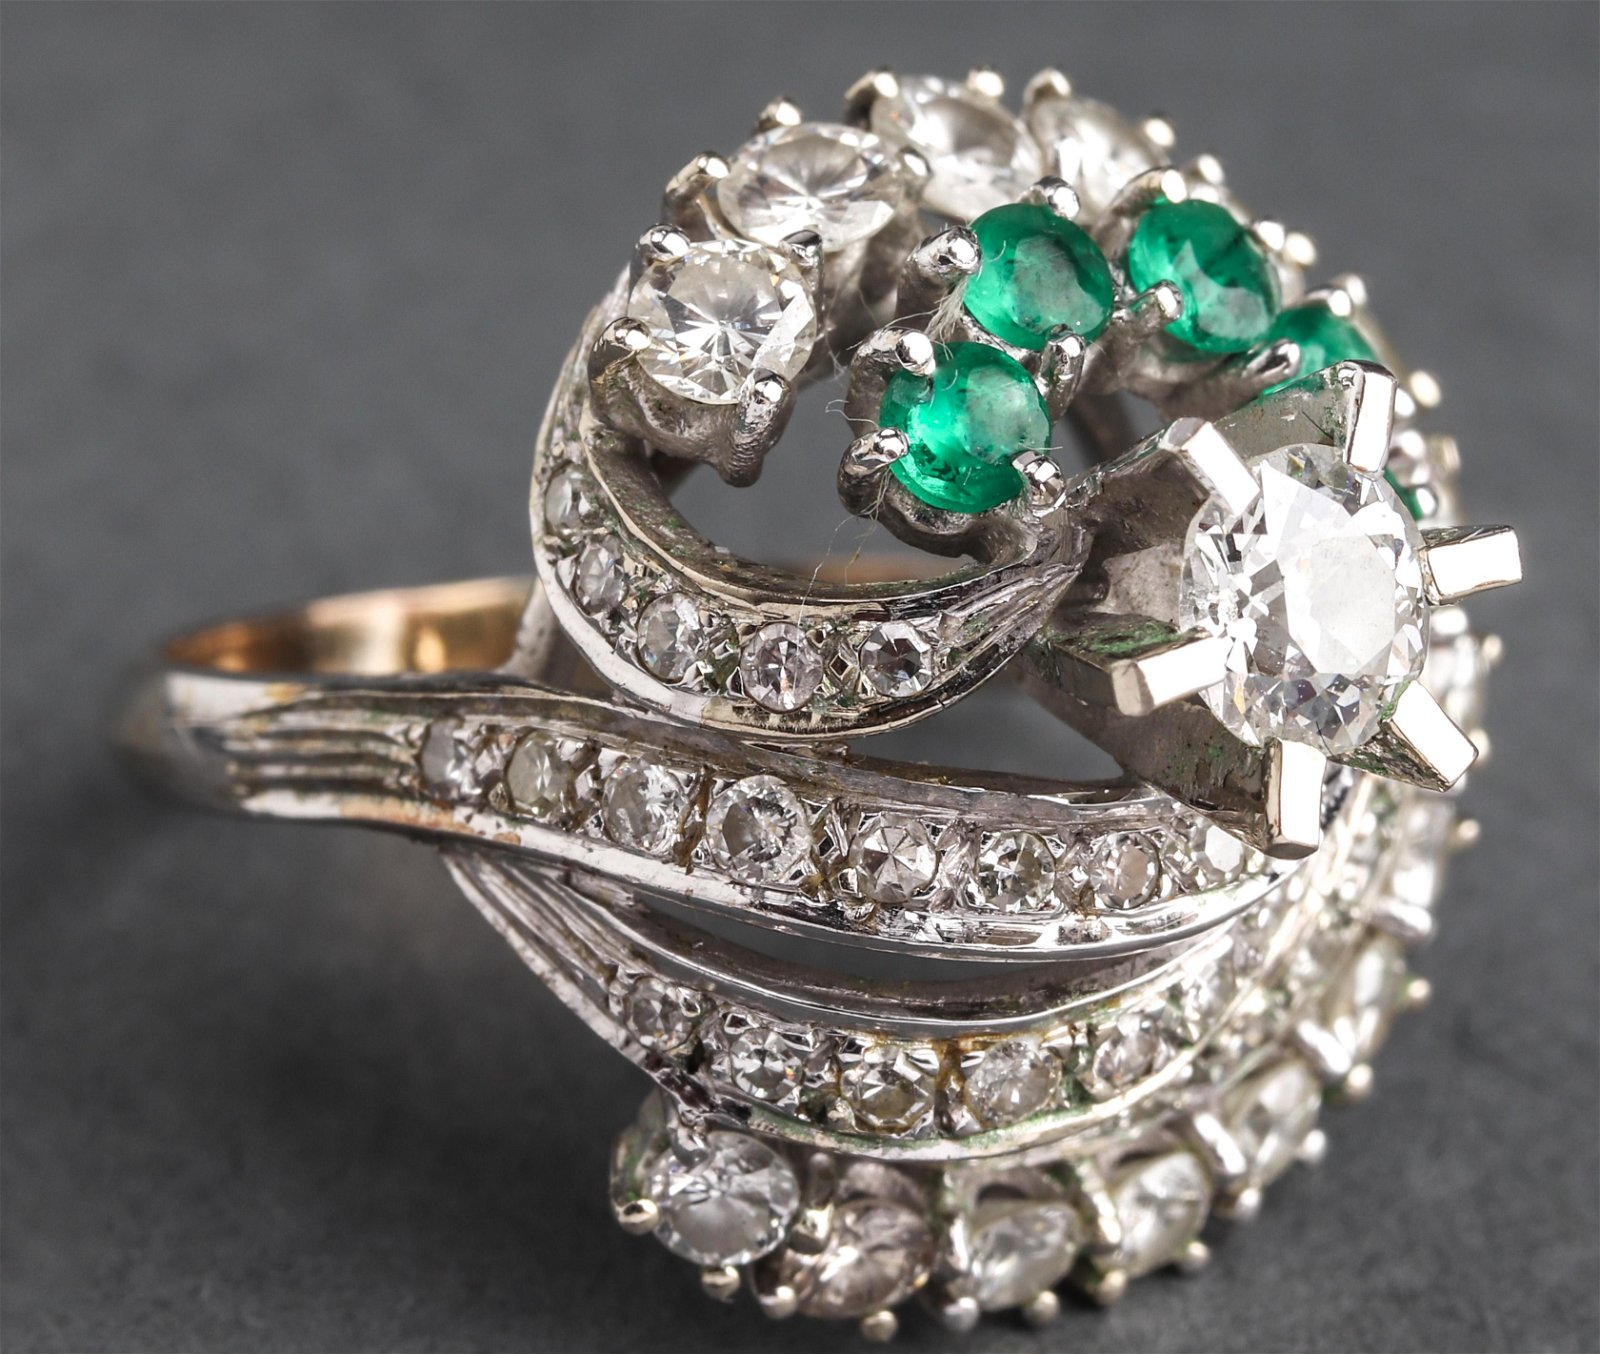 Antique 18K/14K White Gold Diamond & Emerald Ring